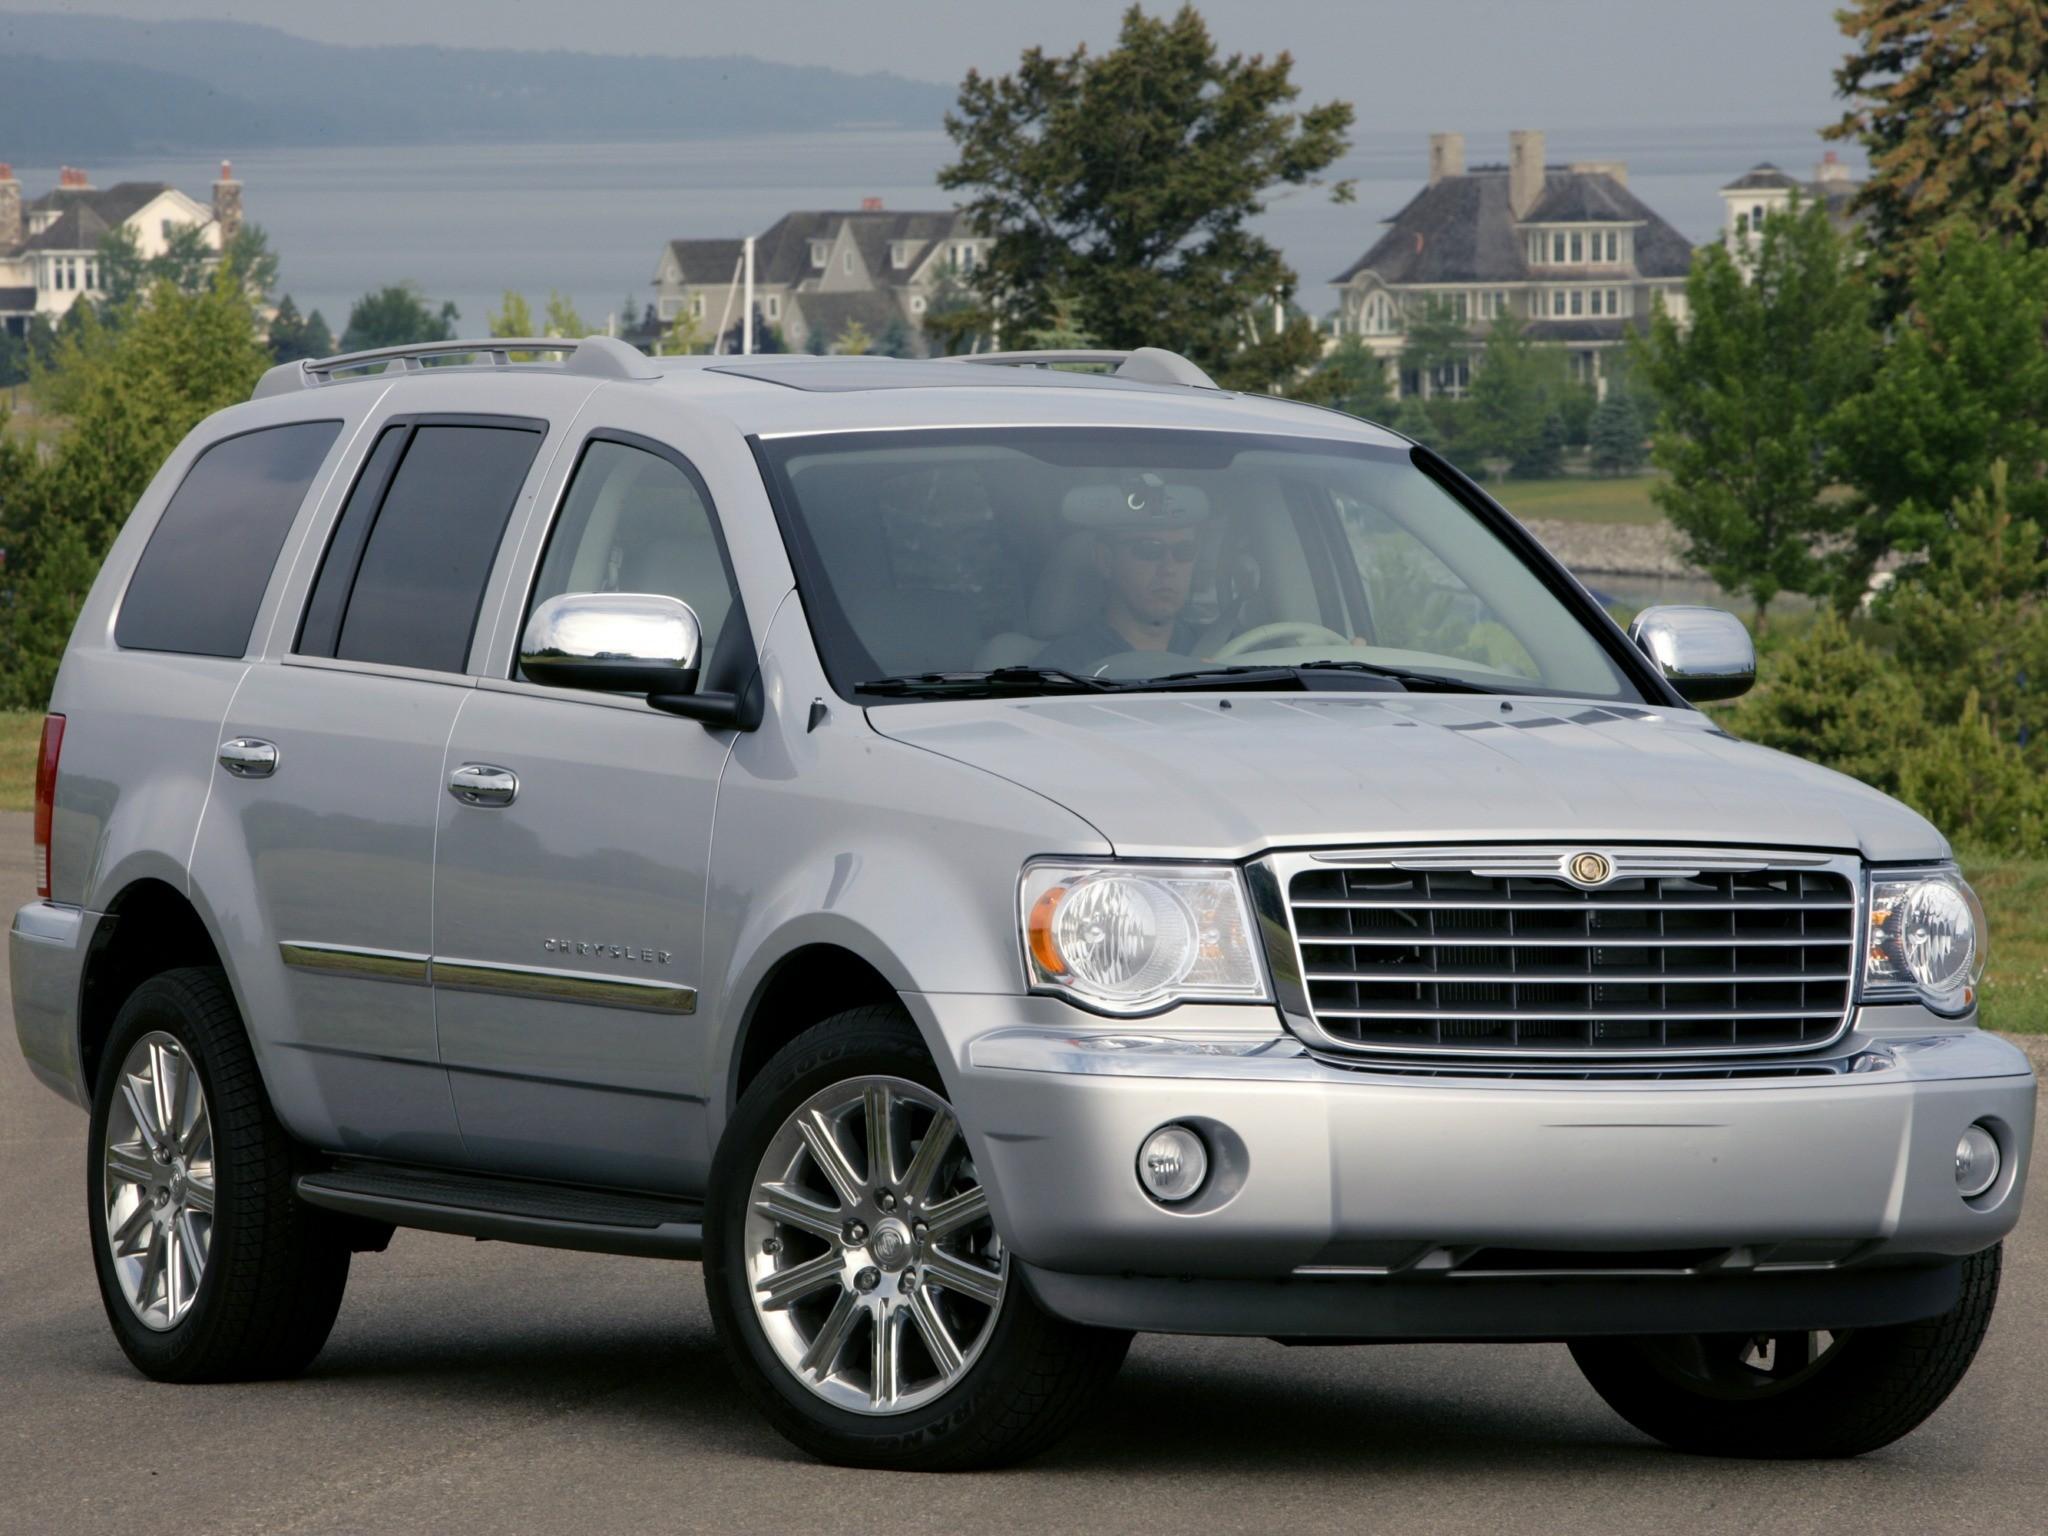 Chrysler Aspen 2006 - 2008 SUV 5 door #3